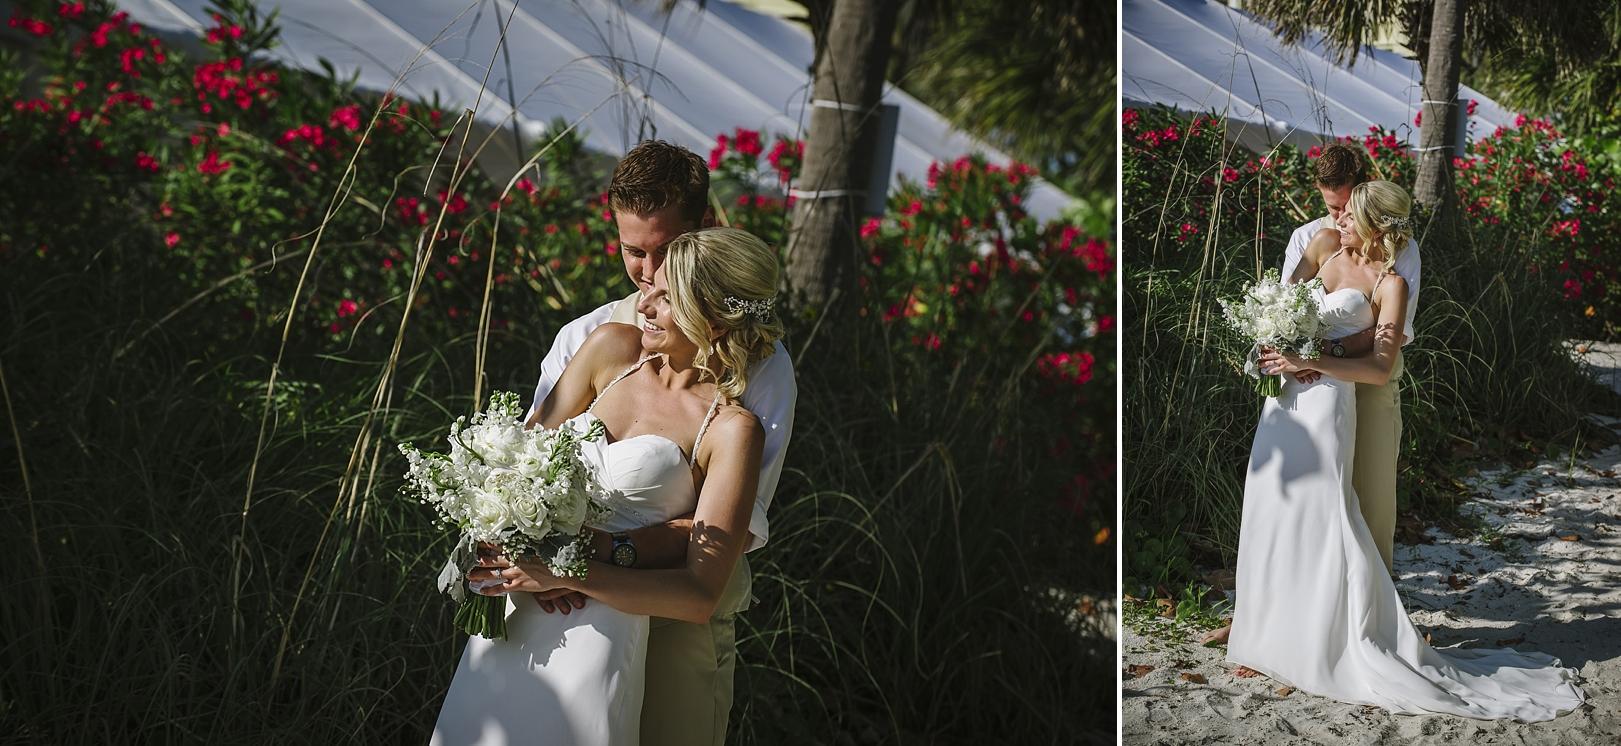 romantic portraits sirata beach wedding photos